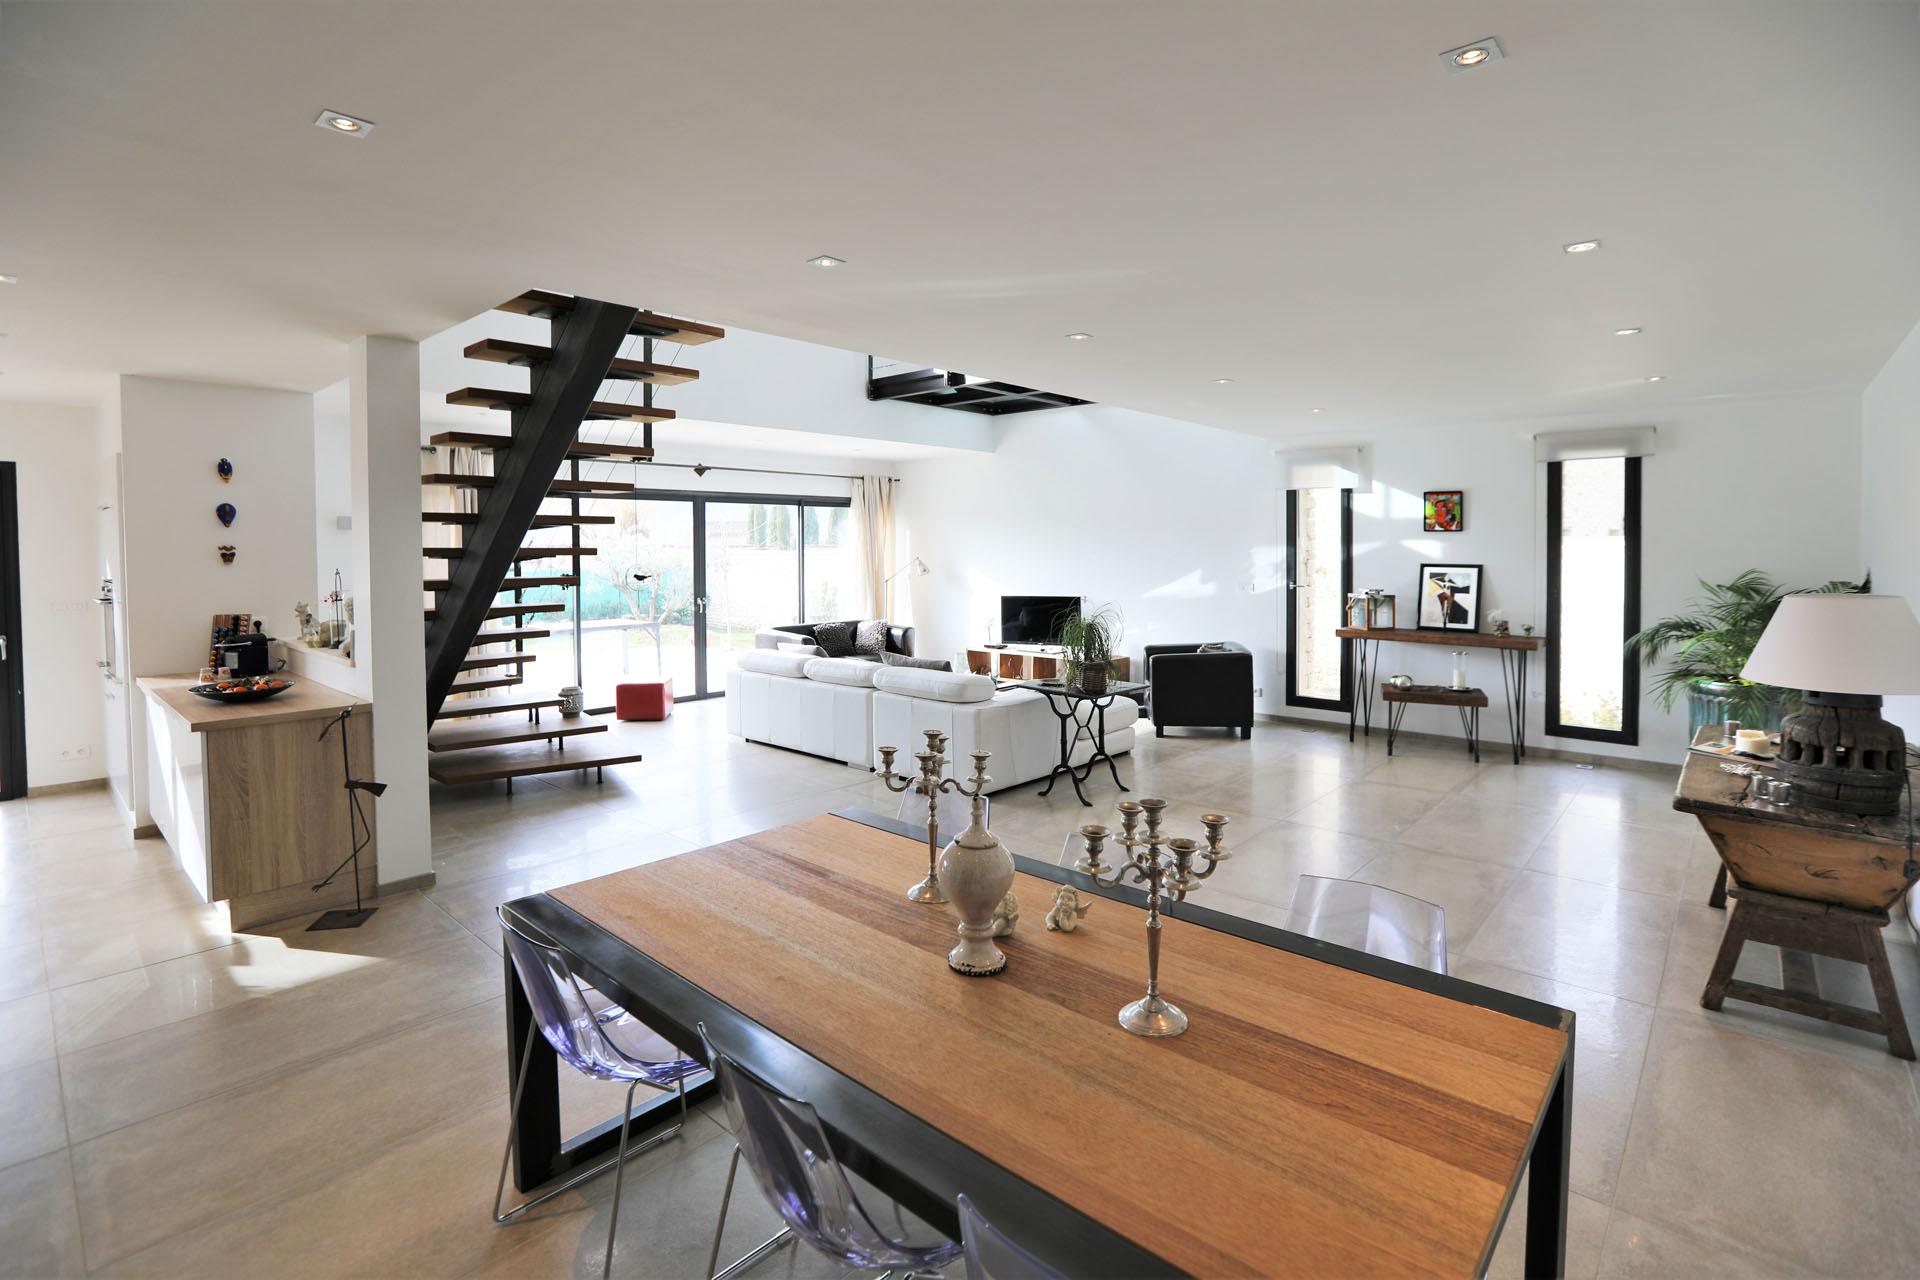 Ventes Gordes, maison moderne en pierre - Agence Rosier